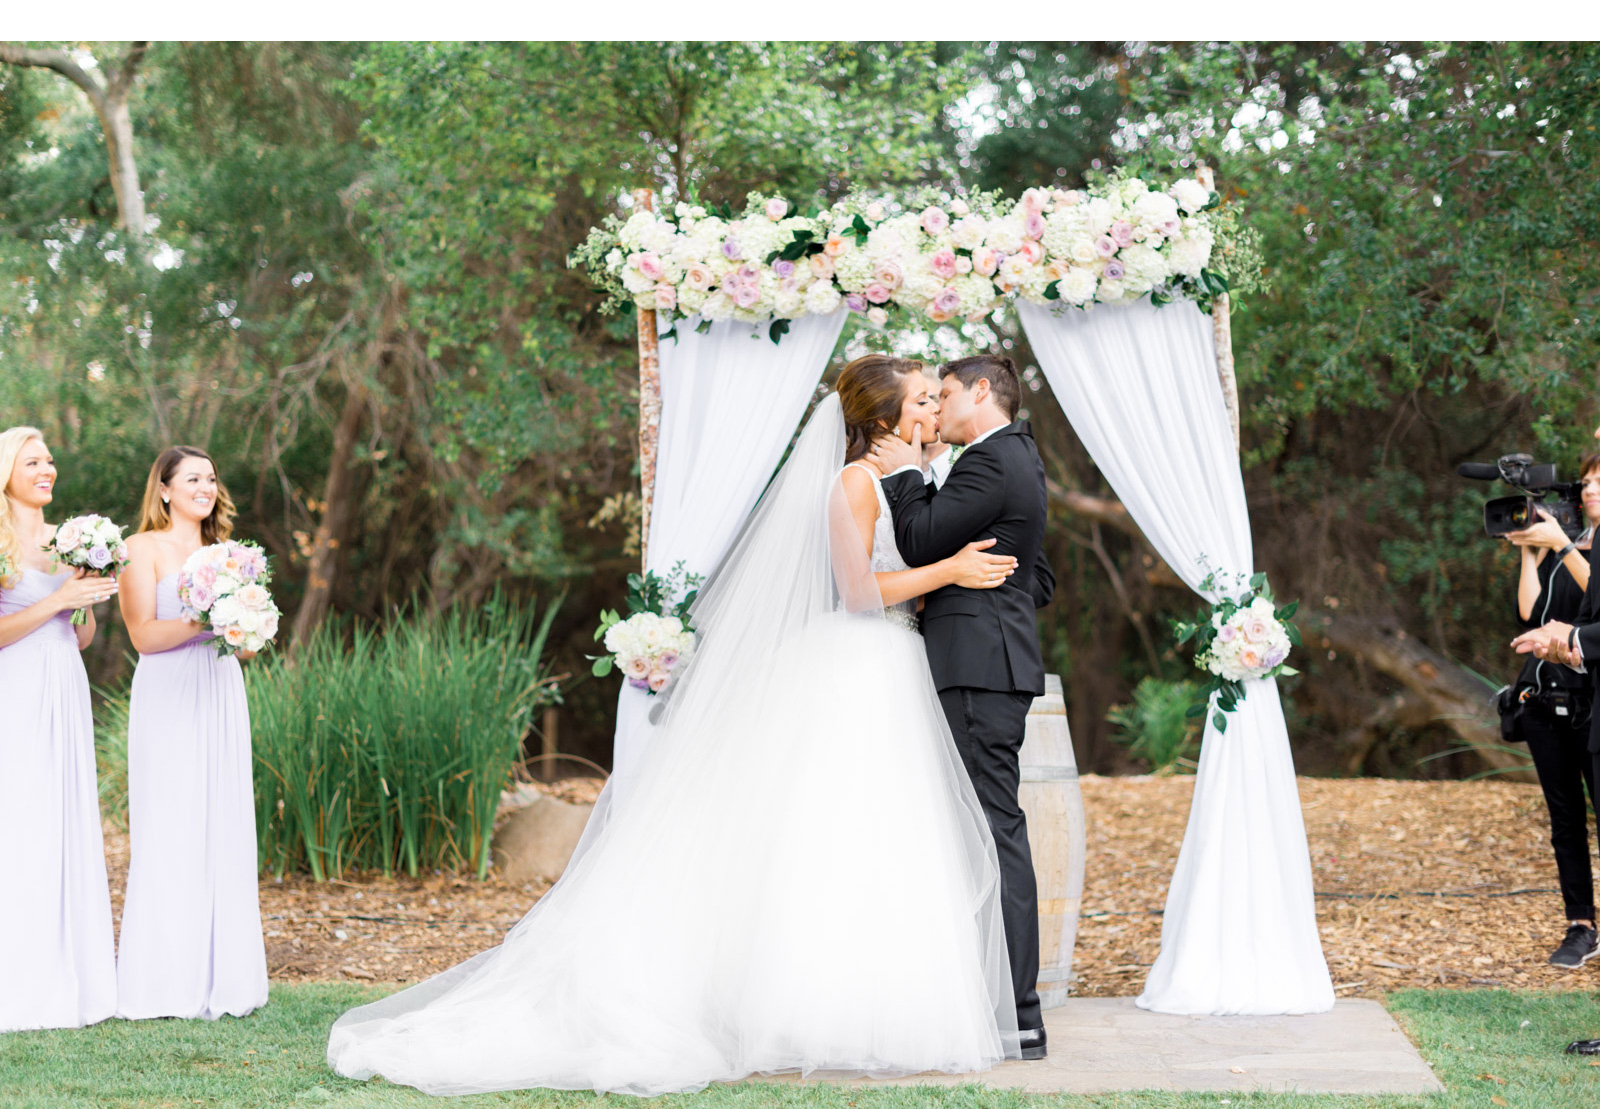 Nia-Sanchez-Miss-USA-Temecula-Wedding-Natalie-Schutt-Photography_07.jpg